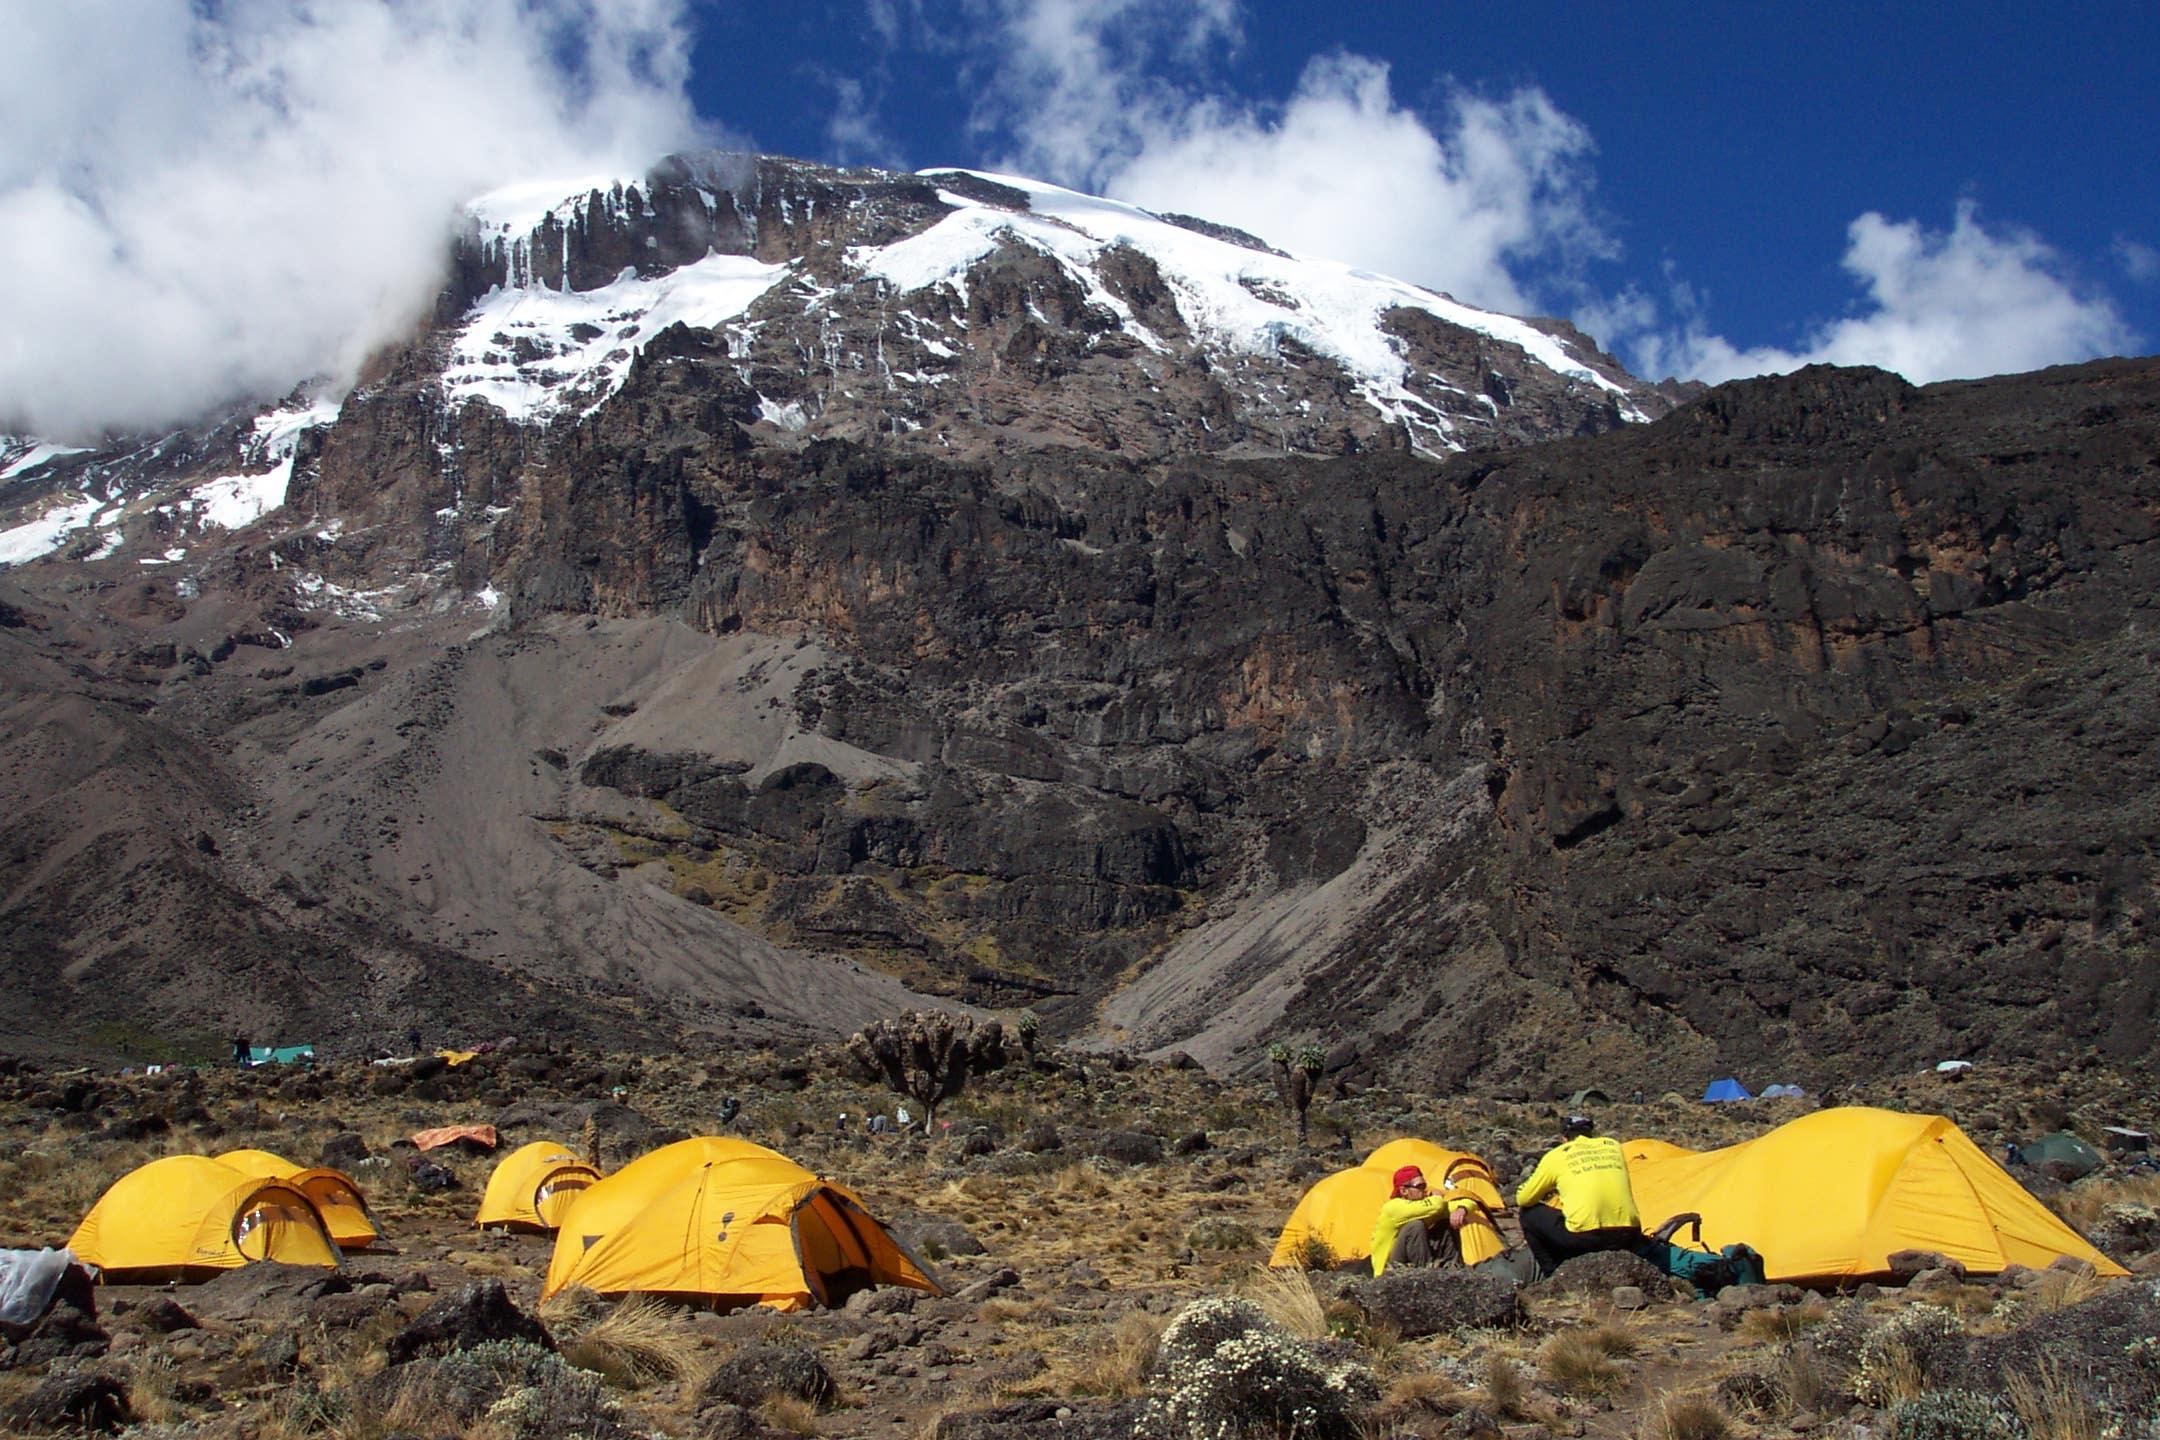 Barranco Camp